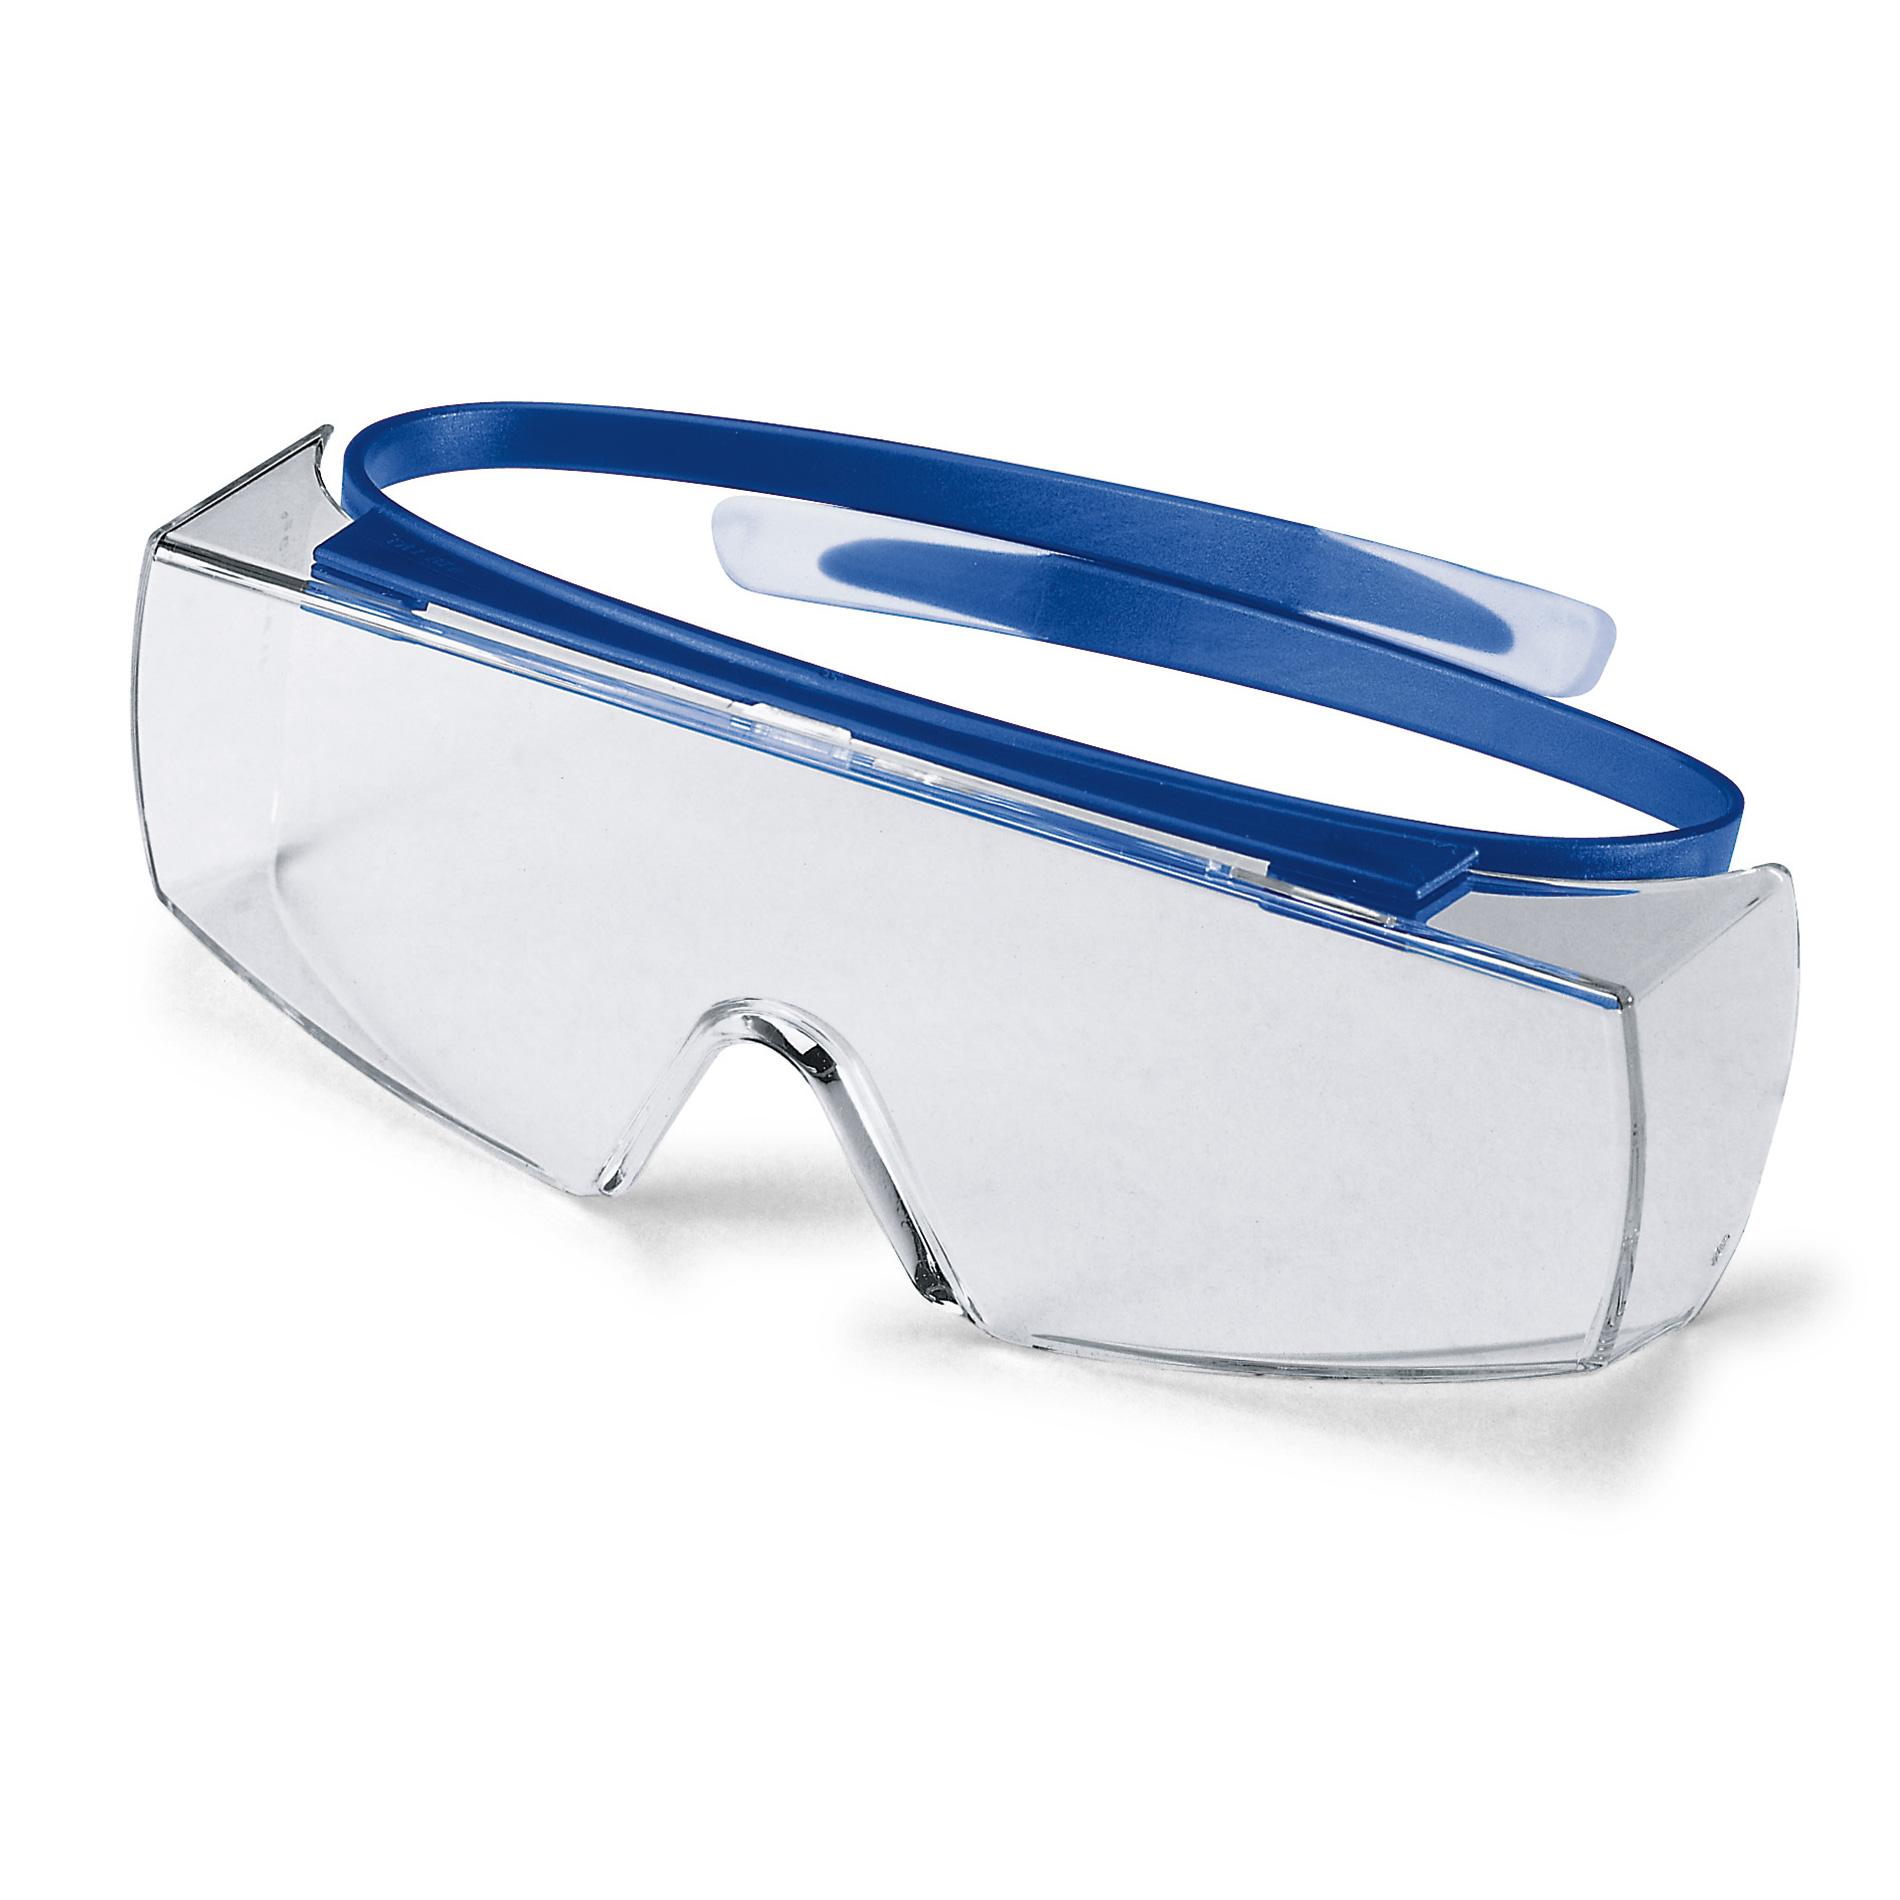 Lunettes à branches uvex super OTG   Protection des yeux   uvex safety c12d86eebee0